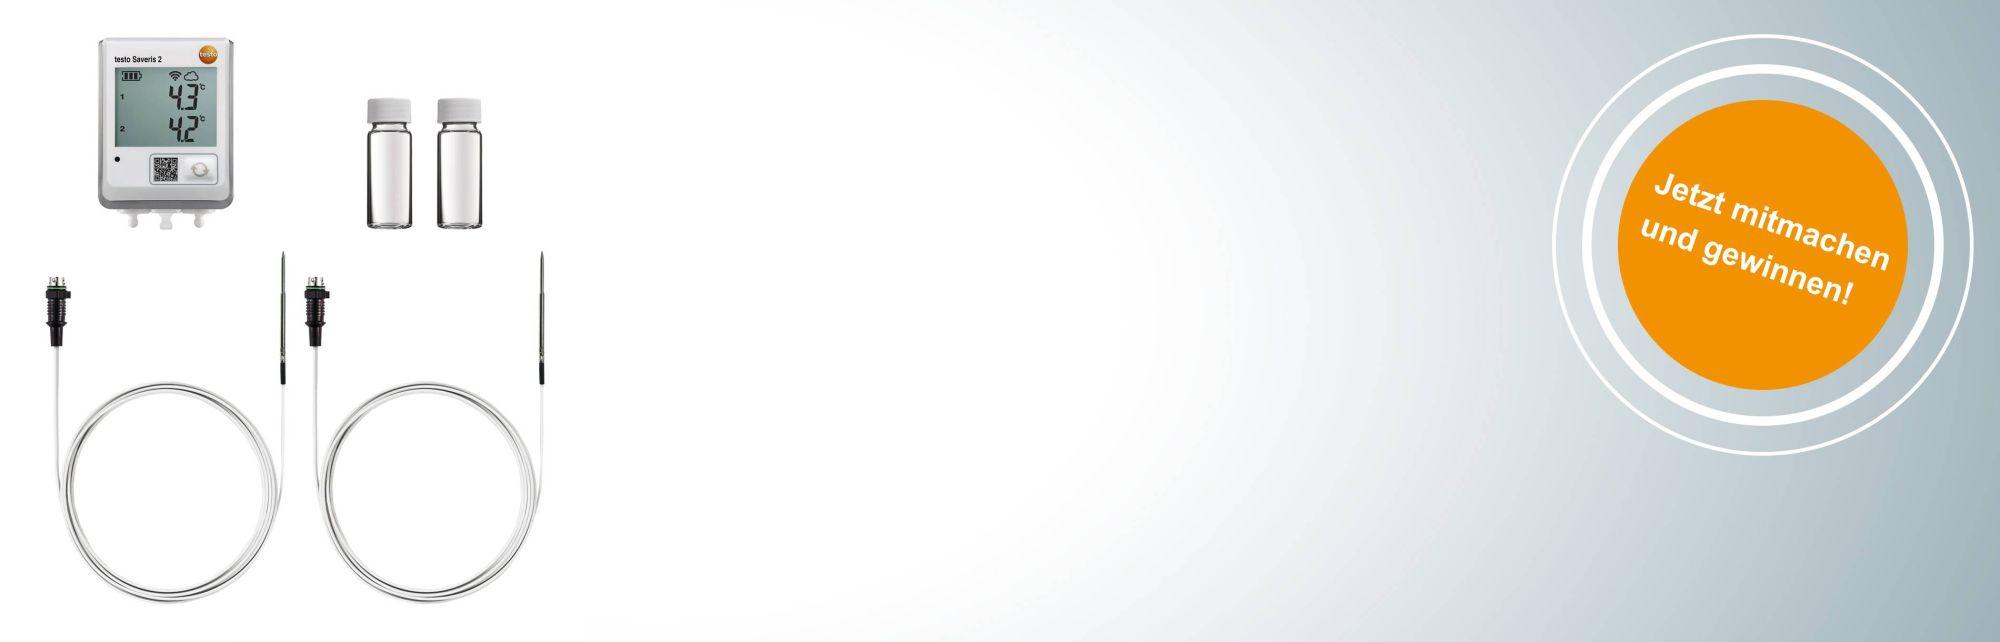 gewinnspiel-set-kuehlschrank-saveris2-full-screen-slider-eyecatcher.jpg